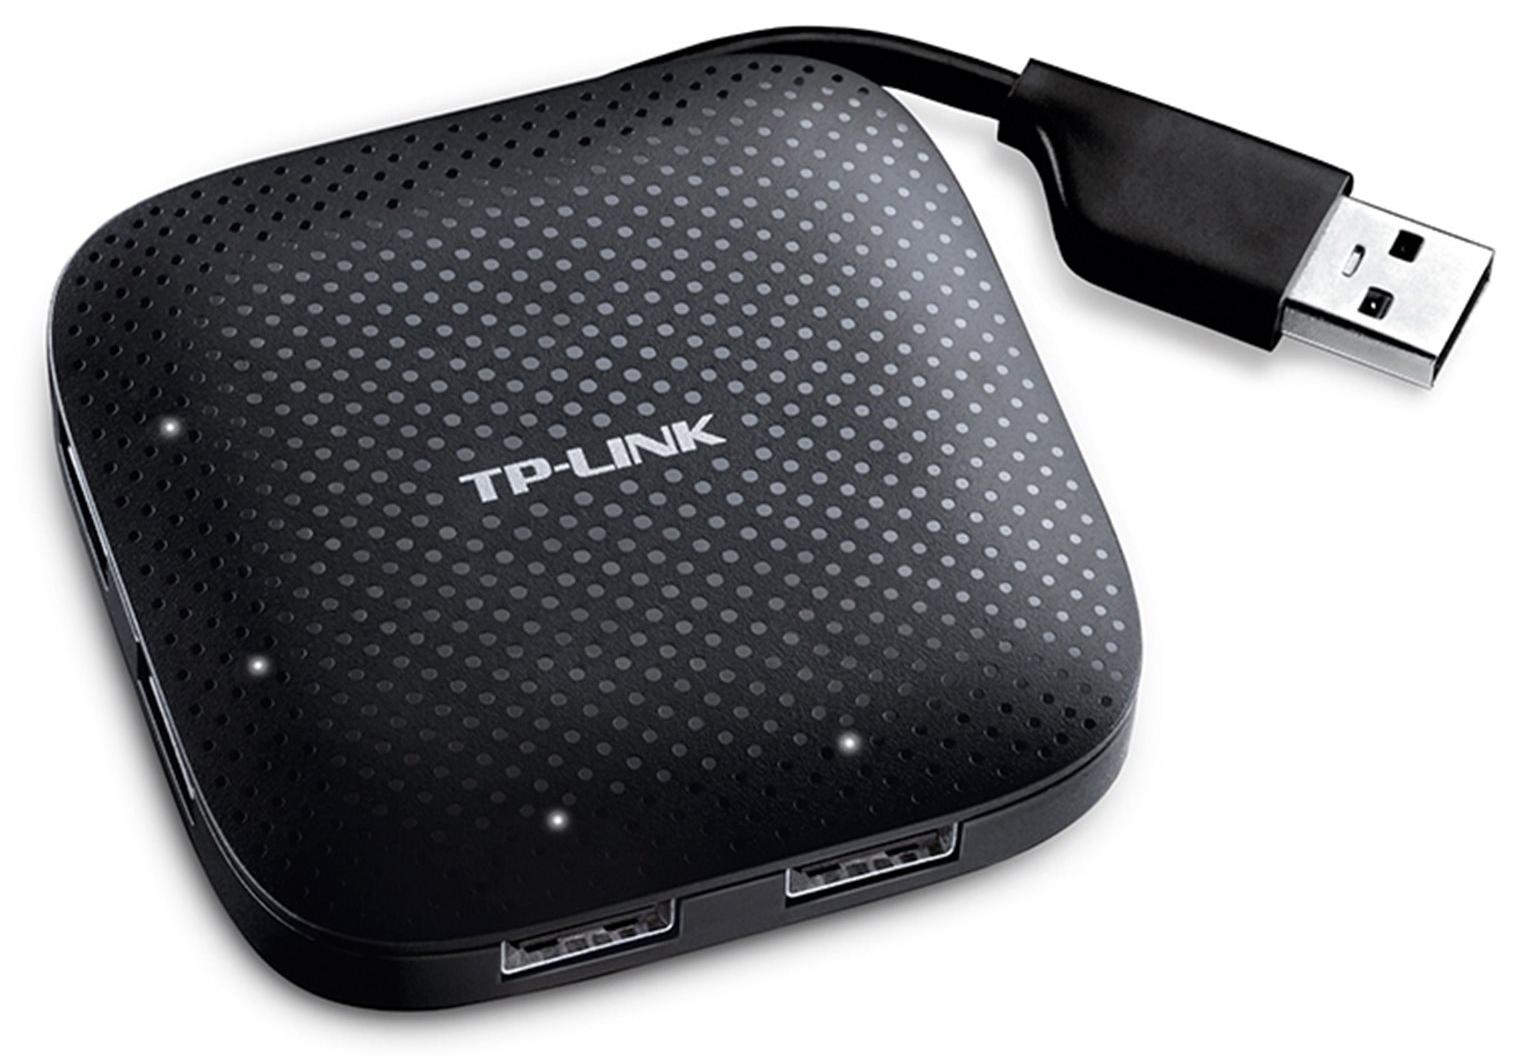 TP-Link UH400, 4-Port USB 3.0 - USB hub